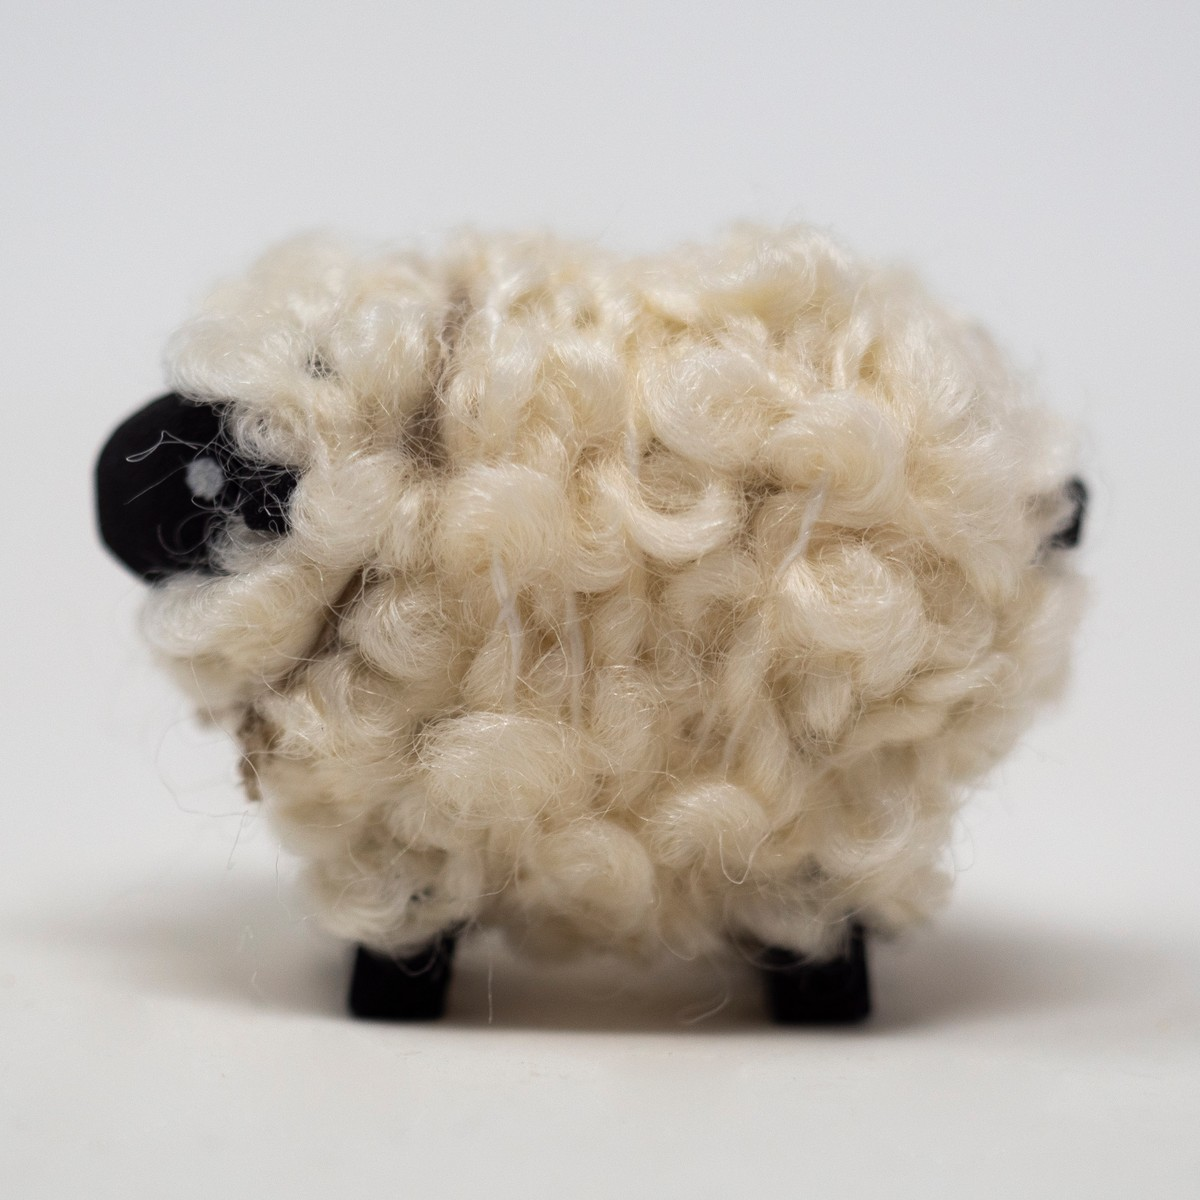 Photo of Medium Suffolk Sheep Figurine